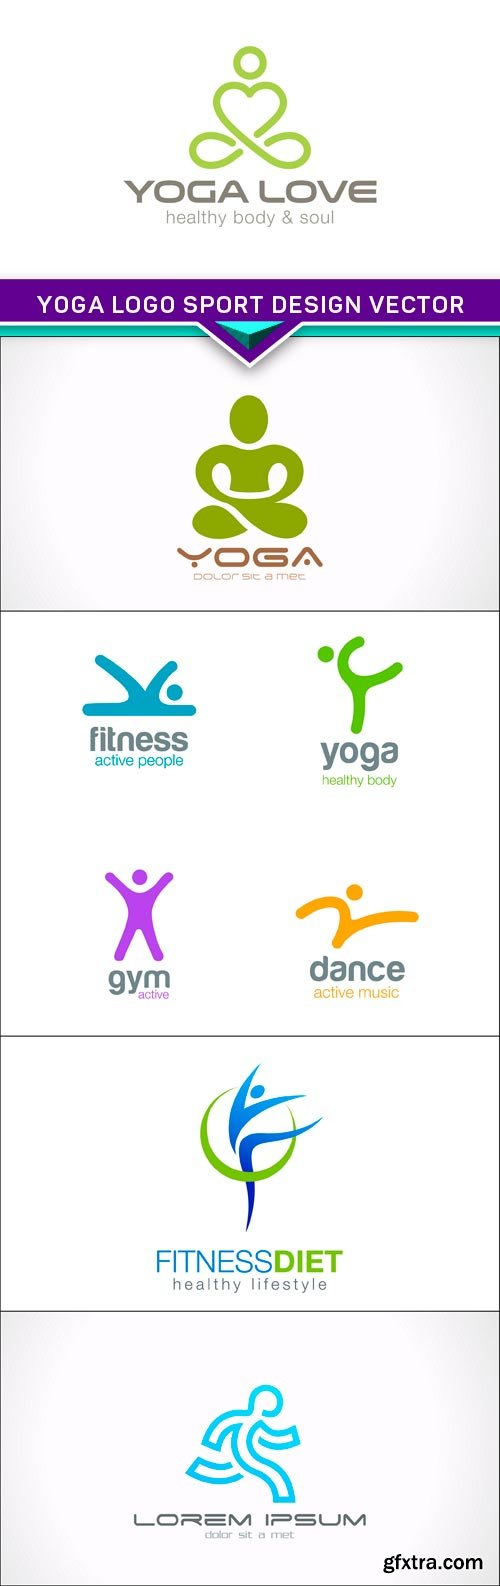 Yoga Logo sport design vector 5x EPS